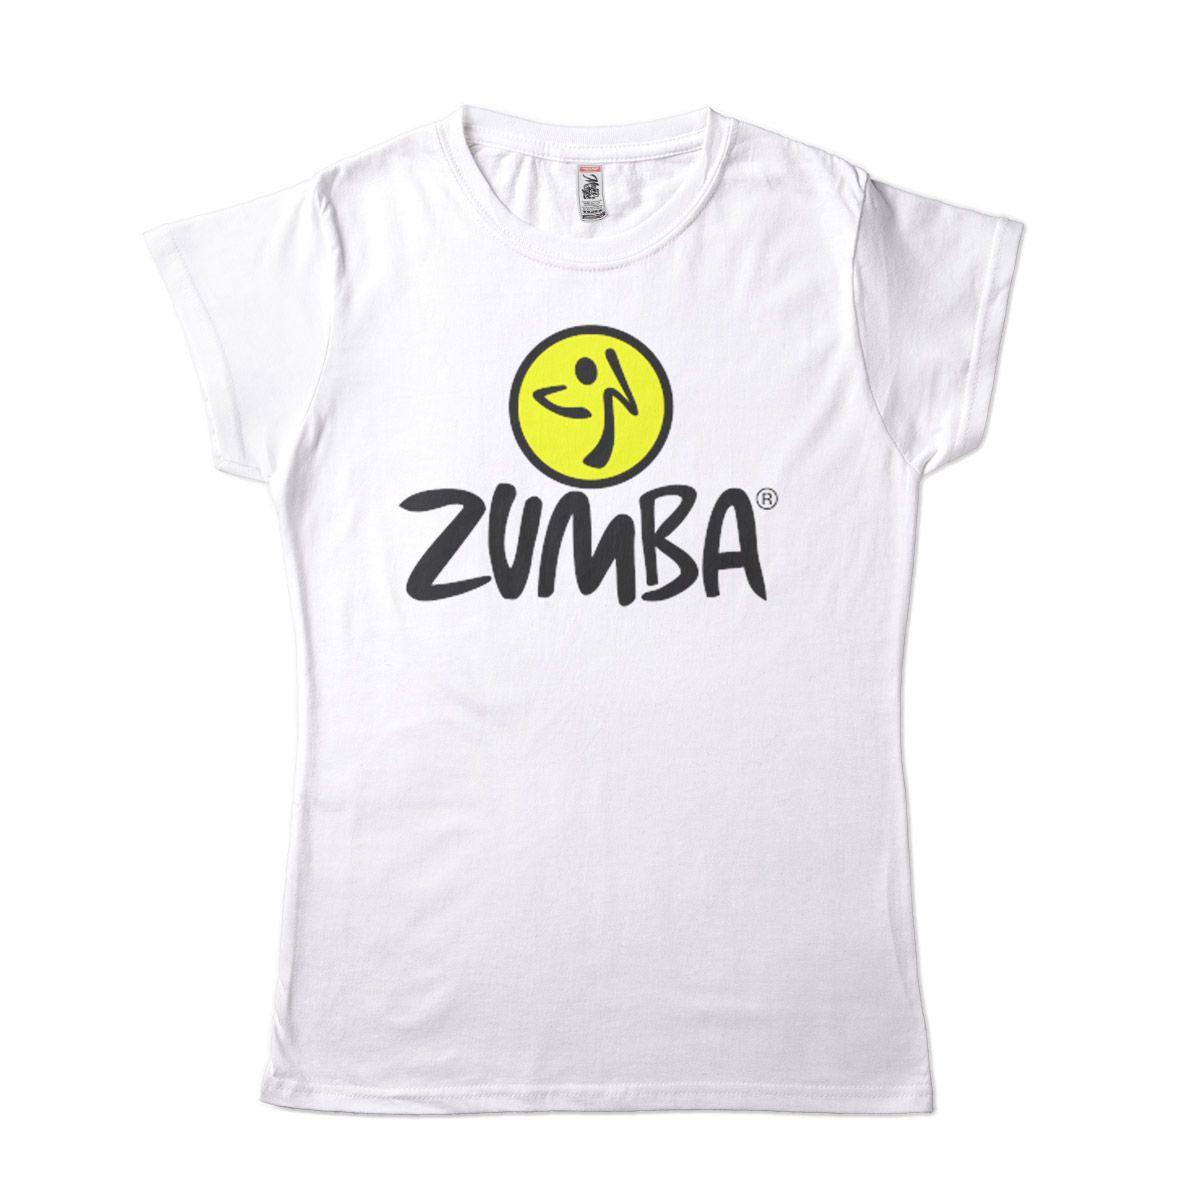 Camiseta Feminia para Zumba Branca